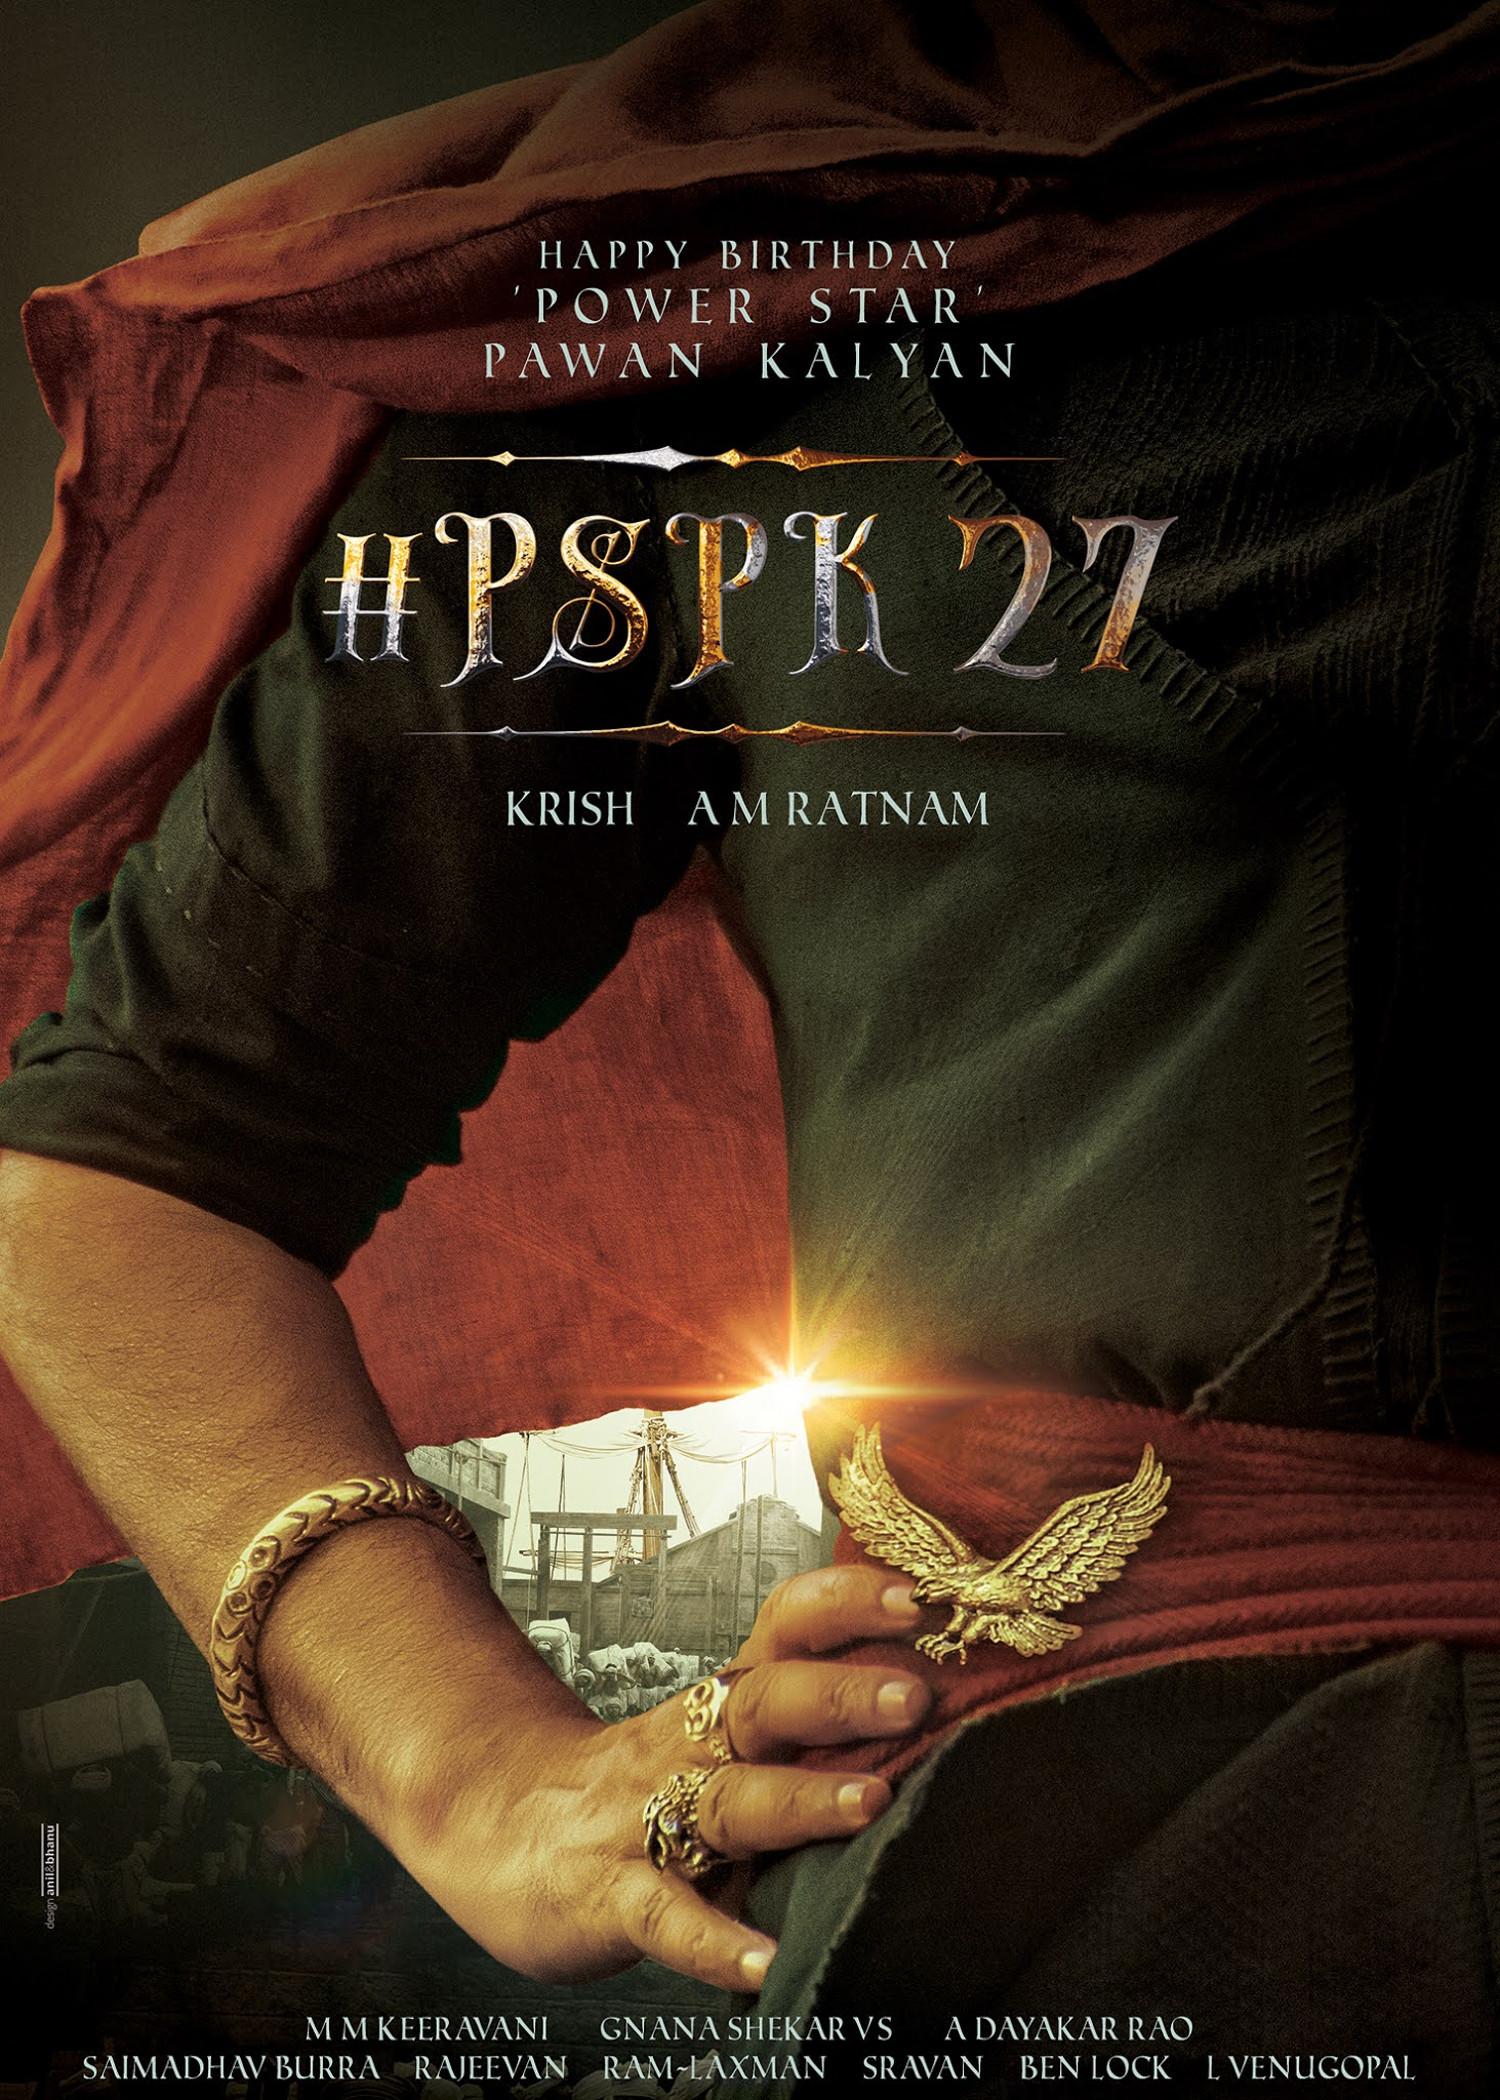 Pawan Kalyan PSPK27 Pre Look Birthday Poster HD